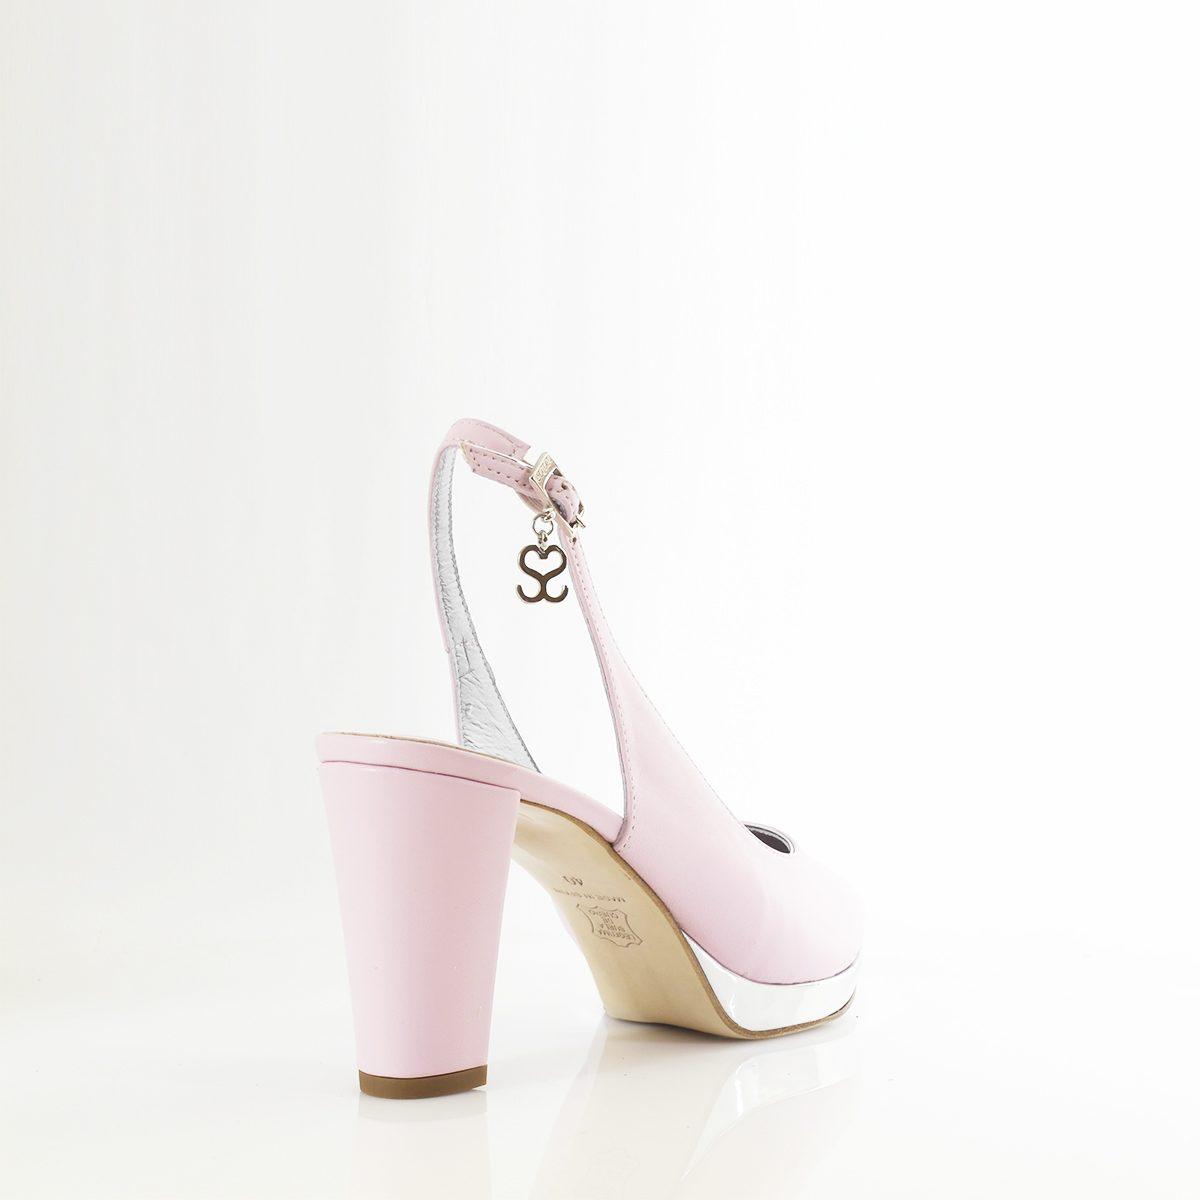 SALON MOD.1864 (10cm) - Zapatos Personalizados Fiesta